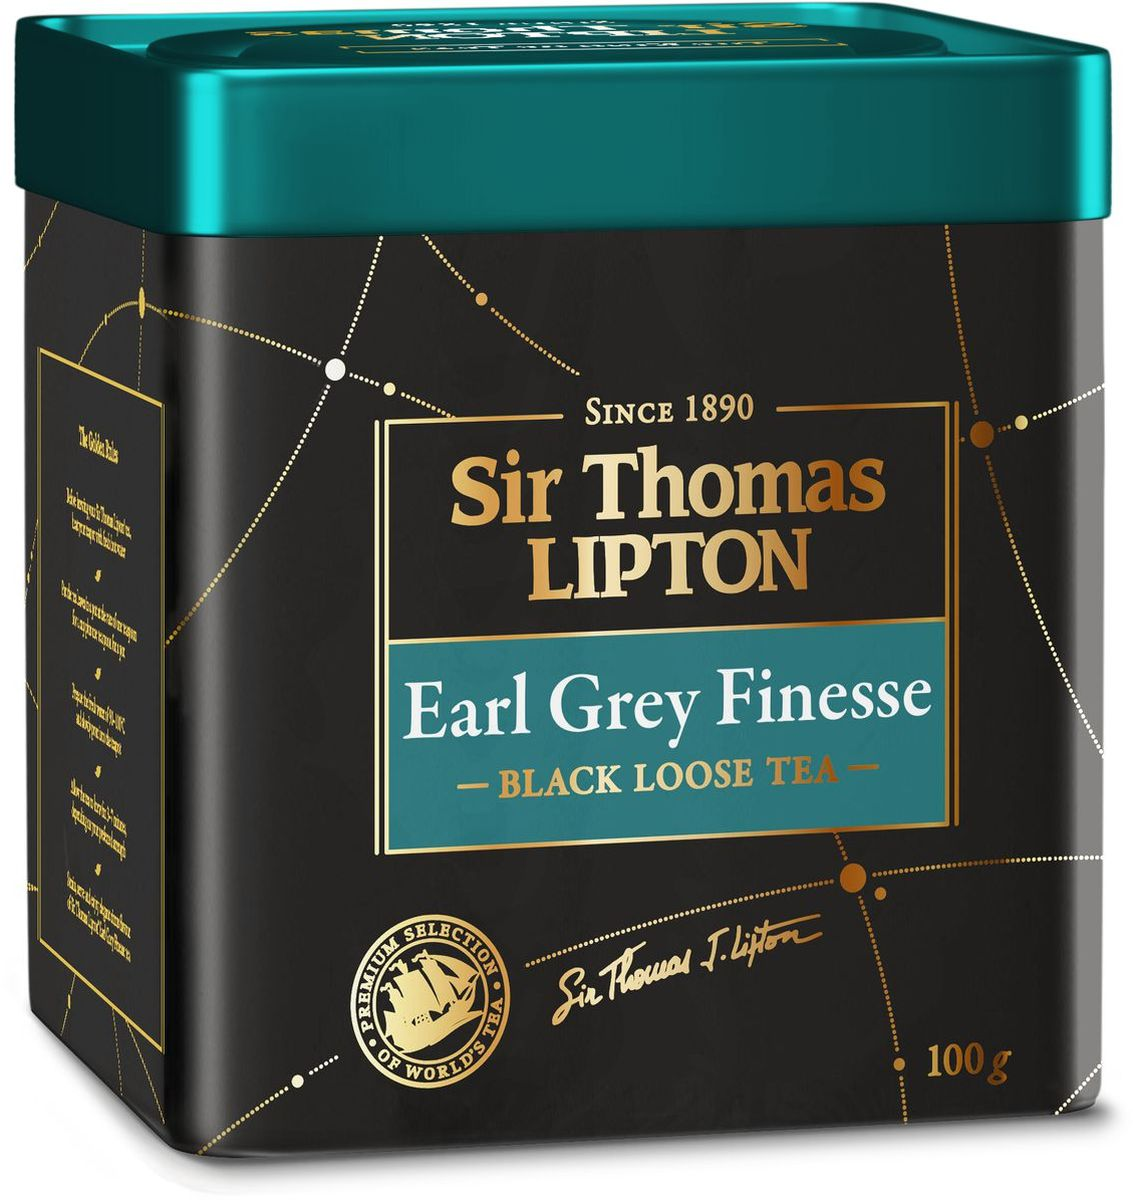 Sir Thomas Lipton Earl Grey Finesse чай черный ароматизированный, 100 г mabroc эрл грей чай черный листовой 100 г